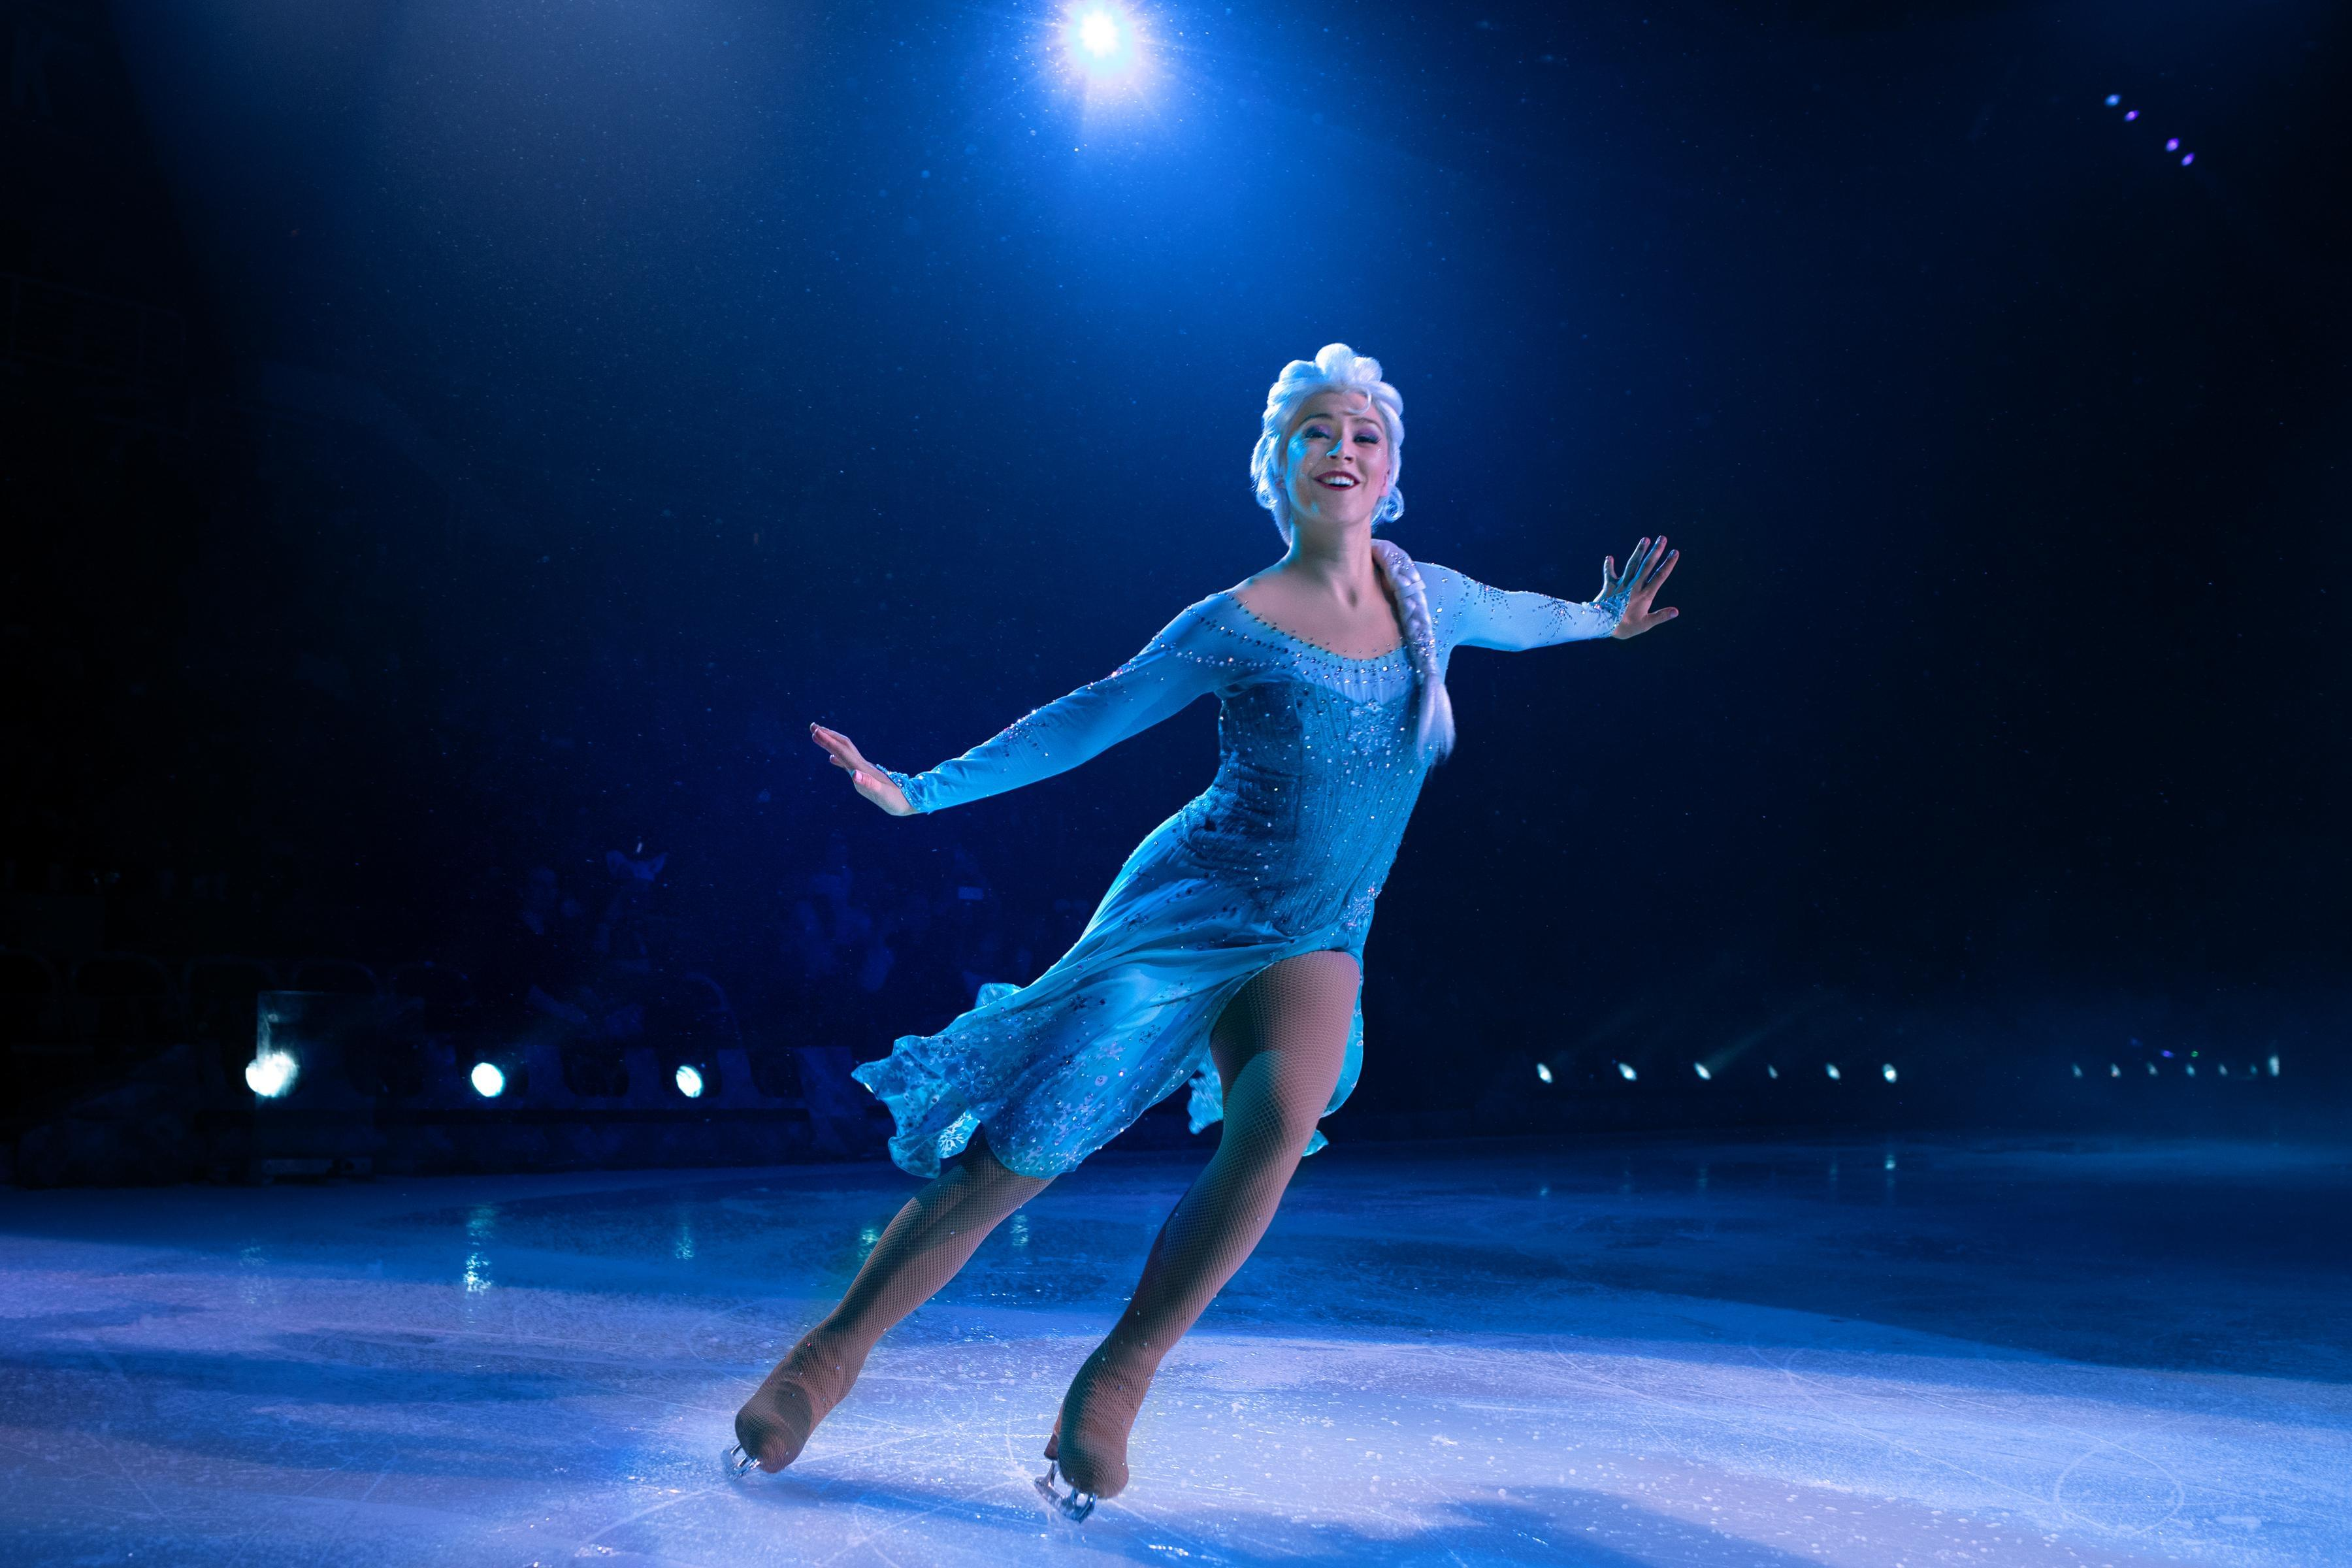 Disney On Ice at Wells Fargo Arena Nov 26 – Dec 6